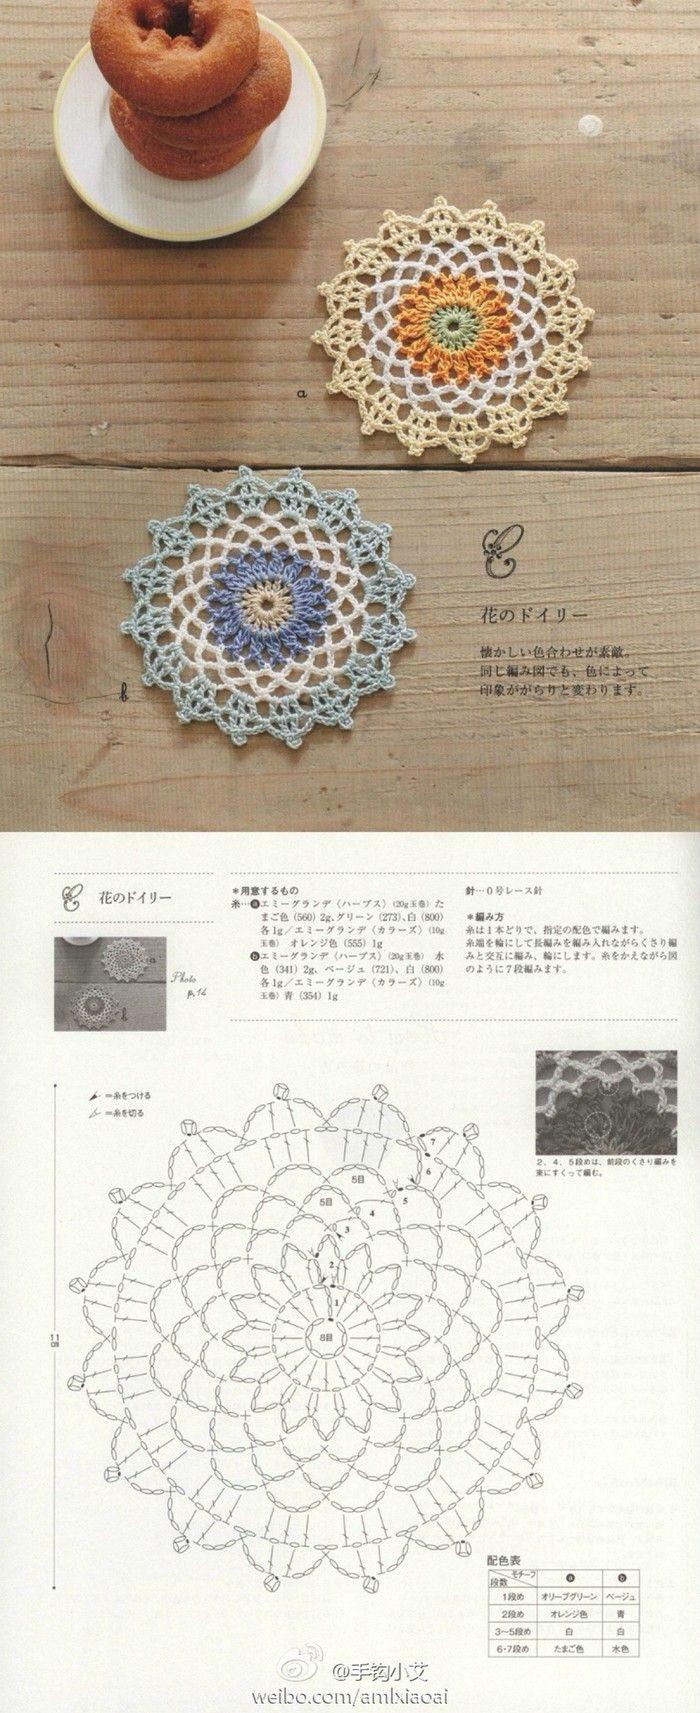 Pin de sandra toro en crochet | Pinterest | Mandalas, Ganchillo y Tejido